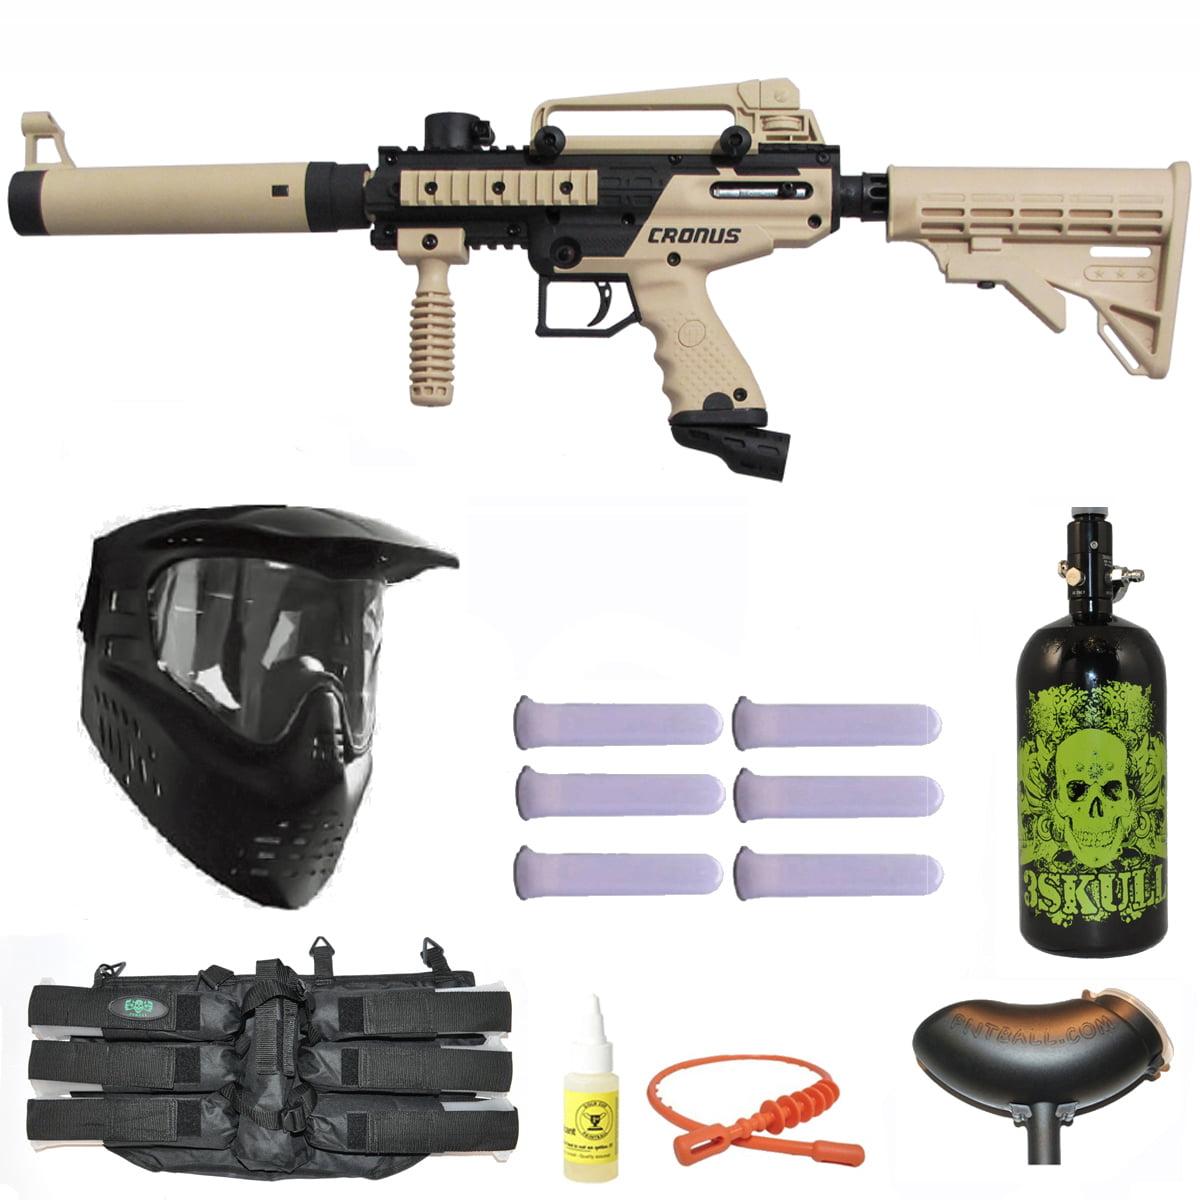 Tippmann Cronus Tactical Paintball Gun 3Skull N2 Mega Set by